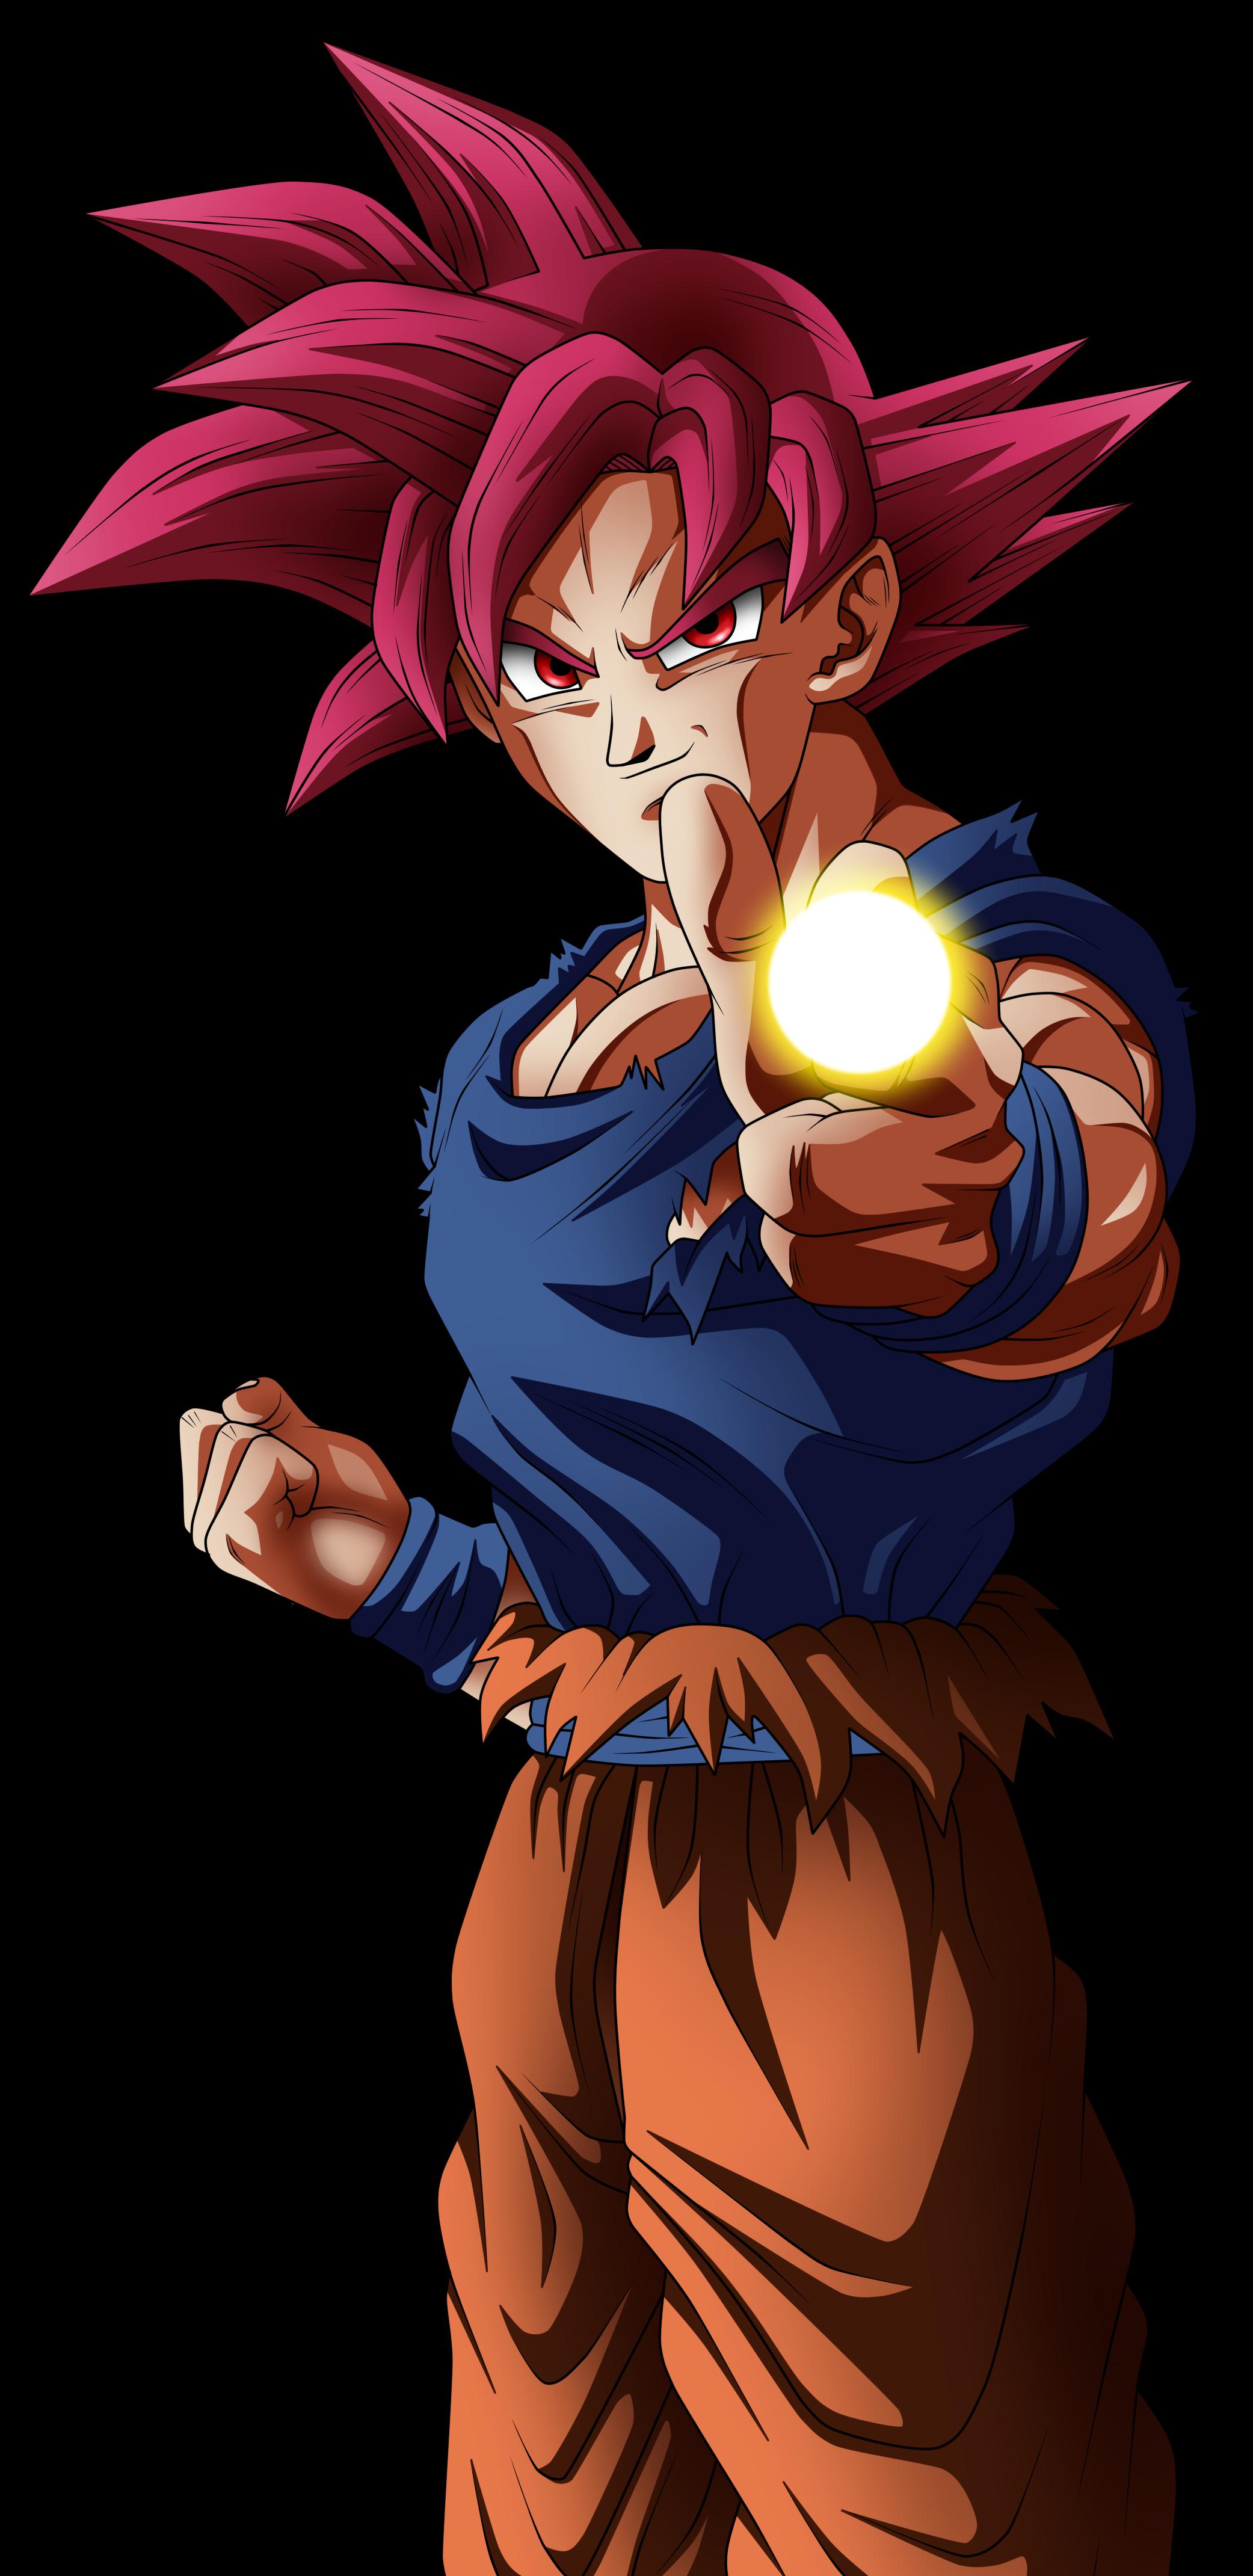 Super Saiyan God Goku By Angelarts2 Dbsslu1 Png 2083 4282 Super Sayajin Arte Sobre Aviacao Anime